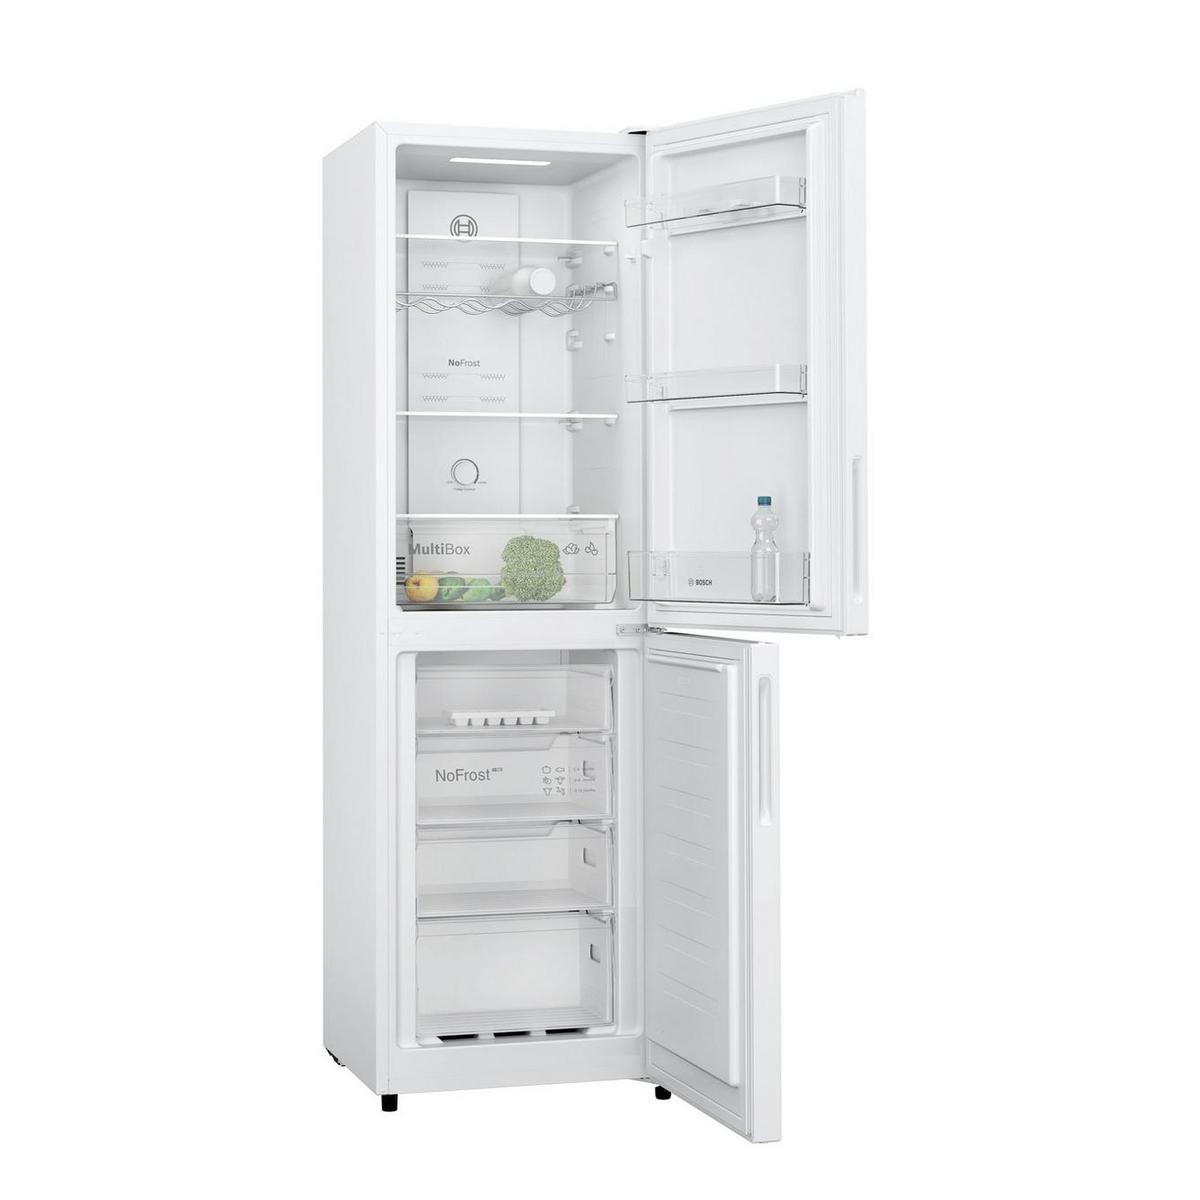 Image of Bosch KGN27NWFAG Freestanding Frost Free Fridge Freezer in White